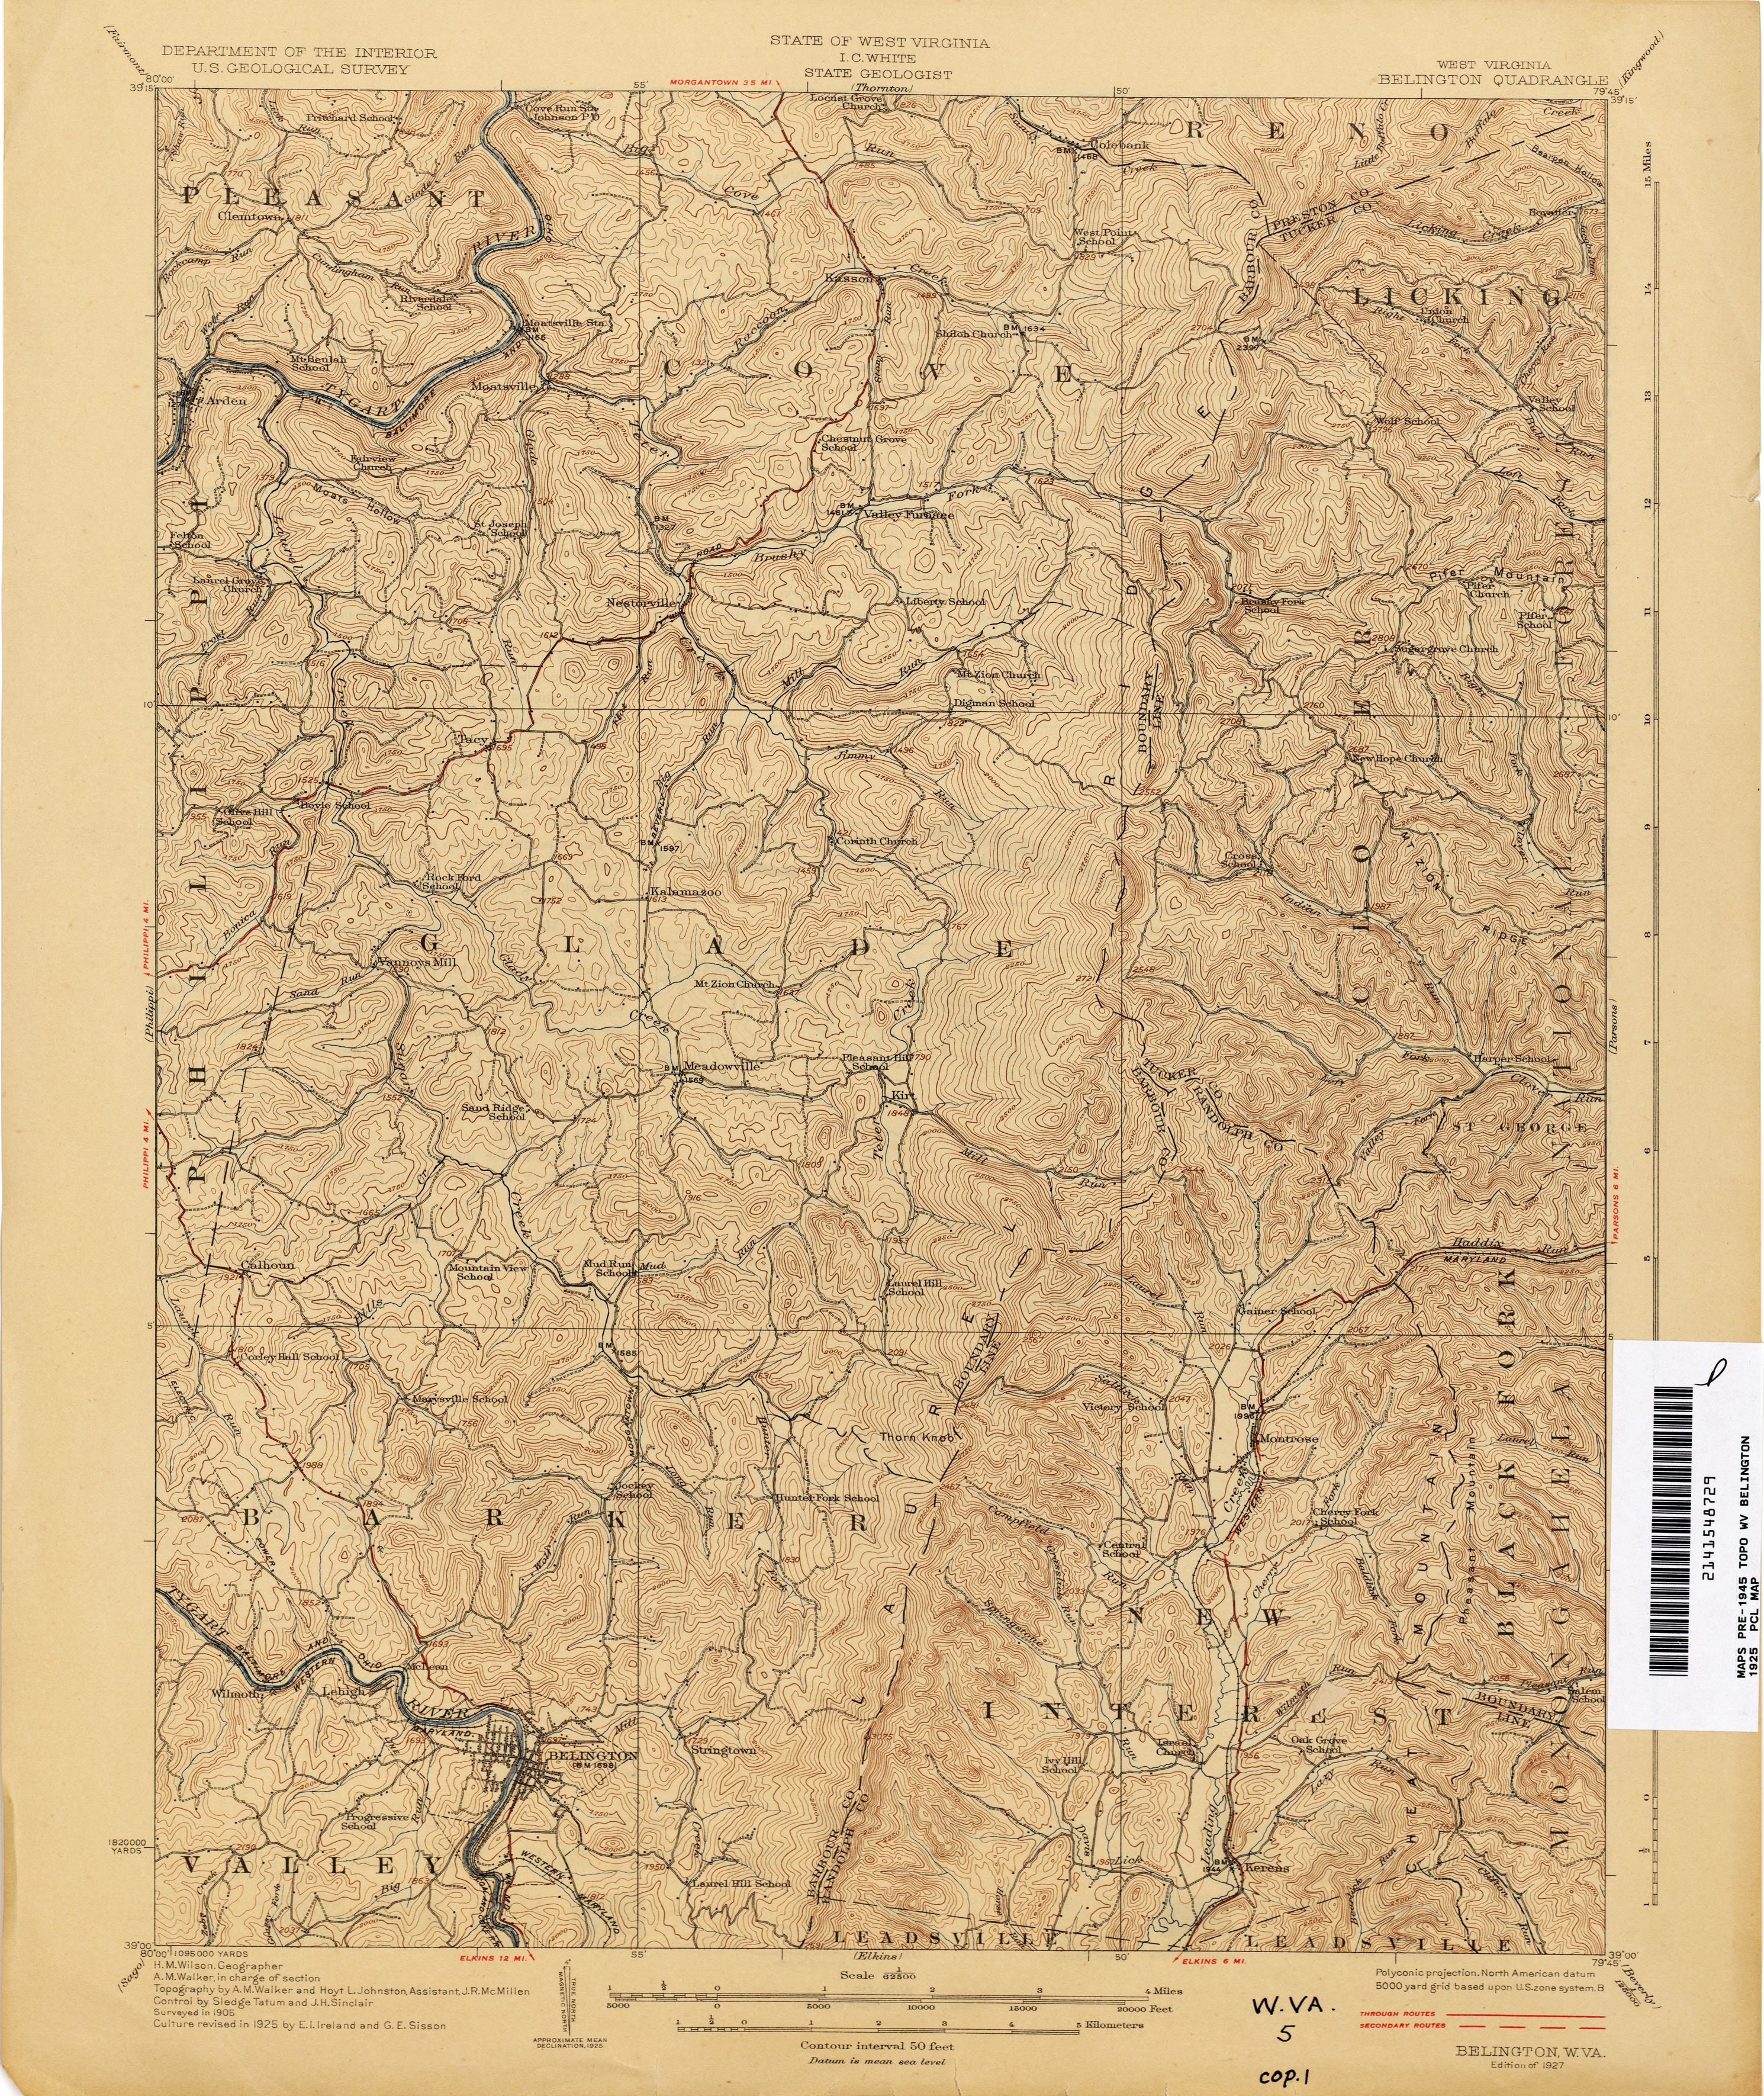 West Virginia Historical Topographic Maps